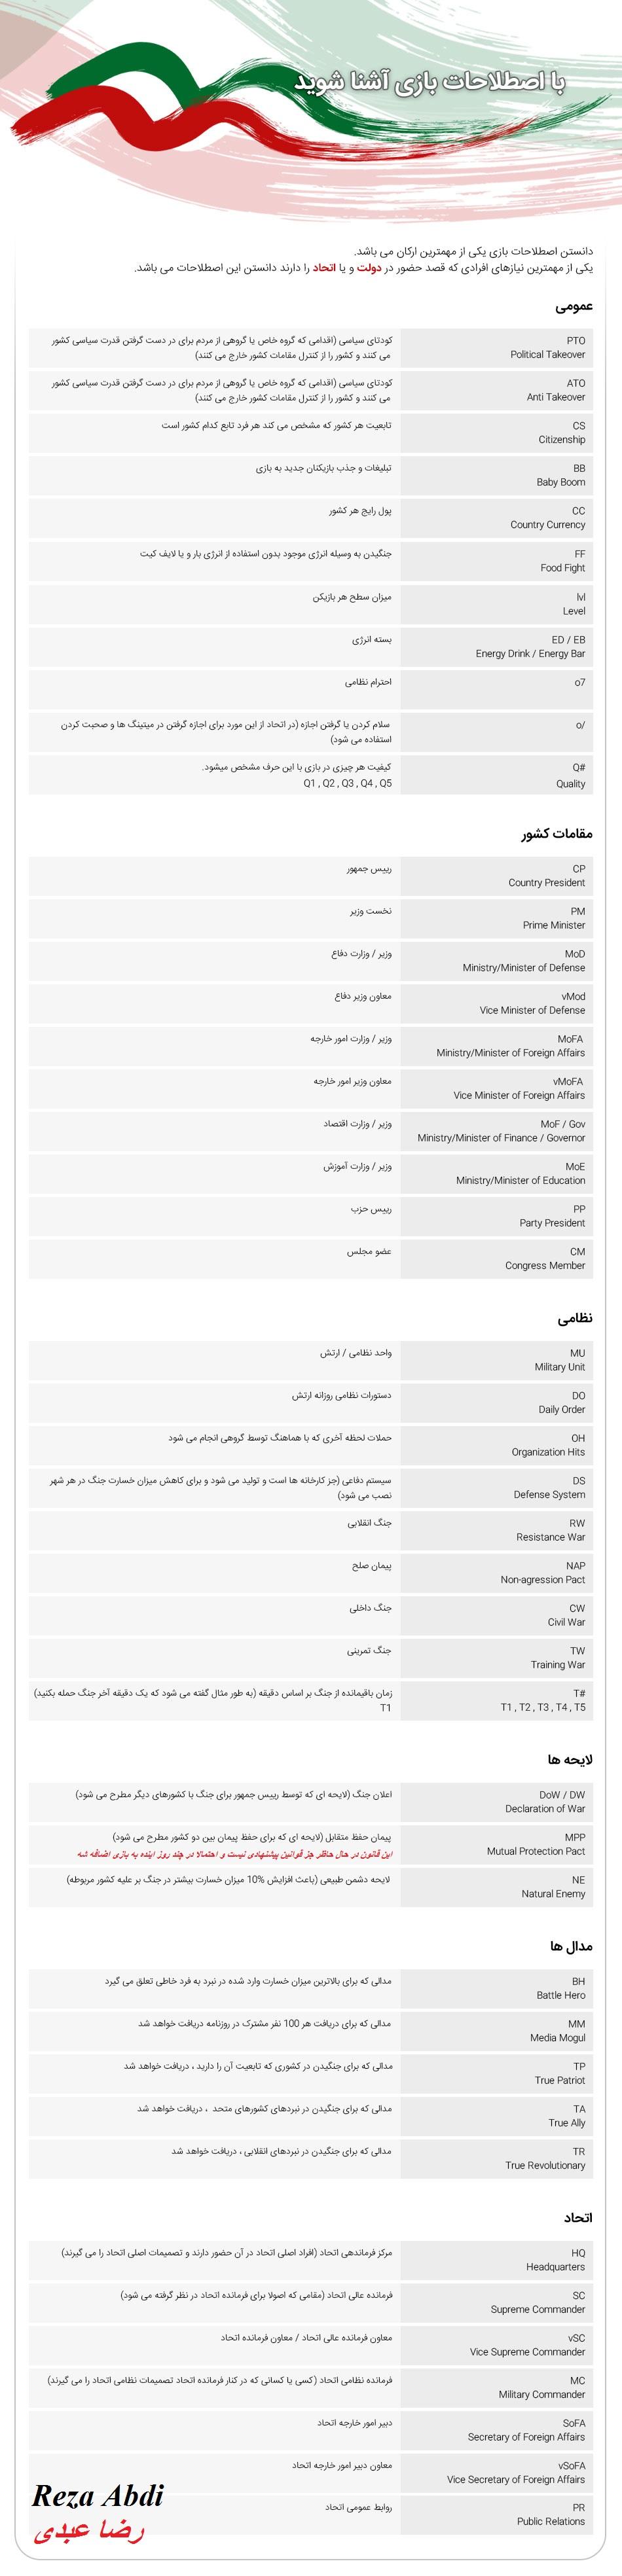 http://uupload.ir/files/uwjw_estelah.jpg